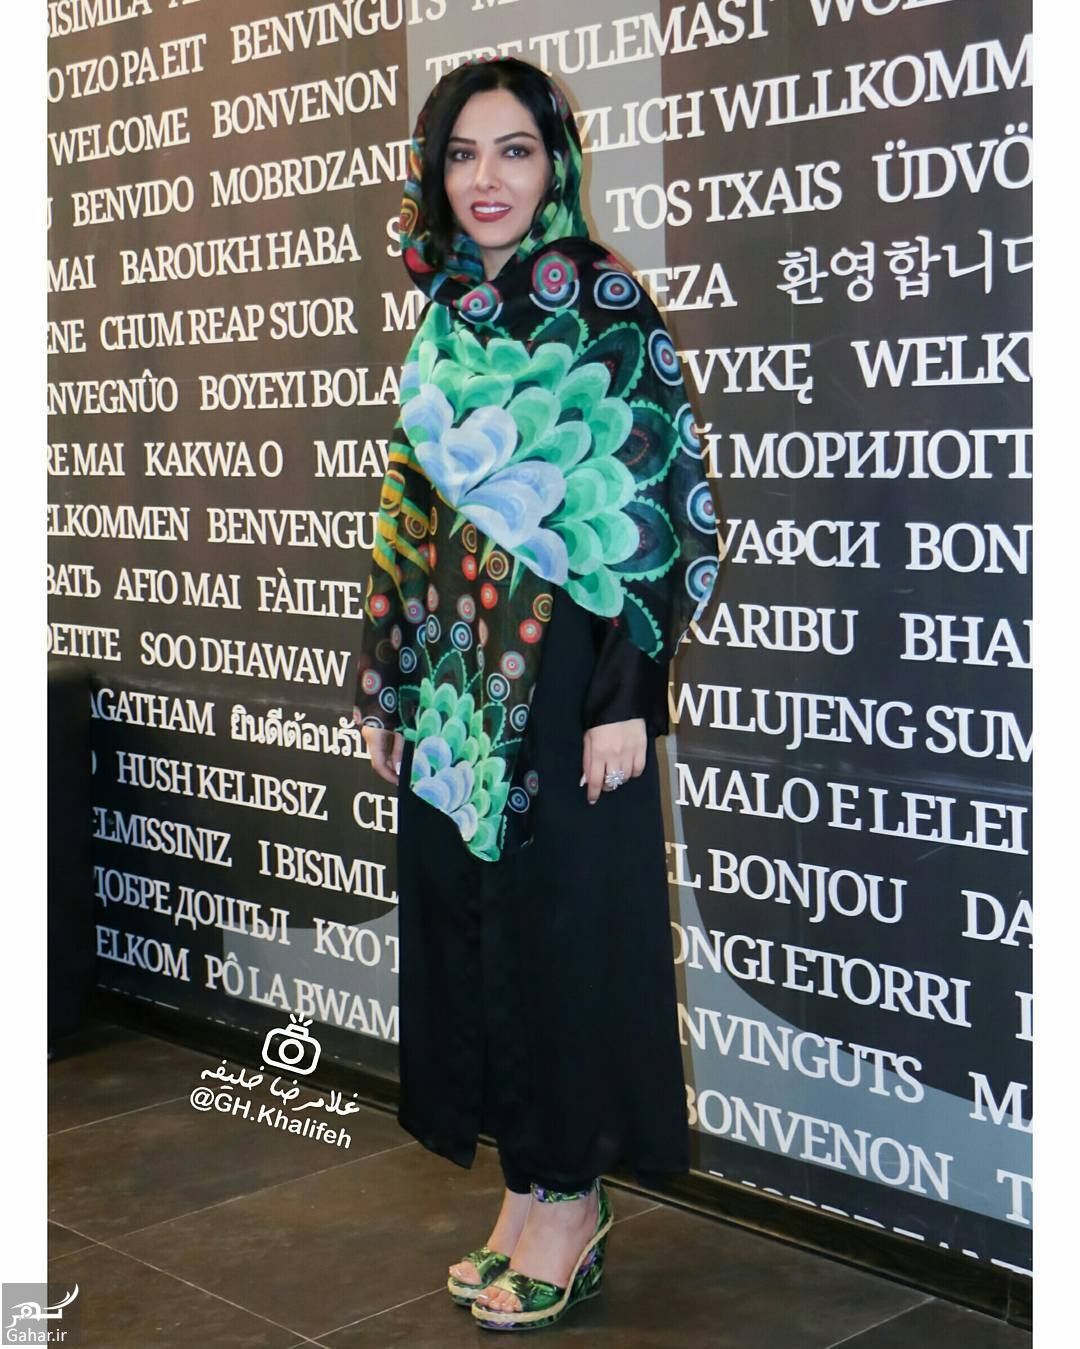 807921 Gahar ir عکس/ تیپ متفاوت لیلا اوتادی در مراسم افتتاحیه فیلم «آشوب»